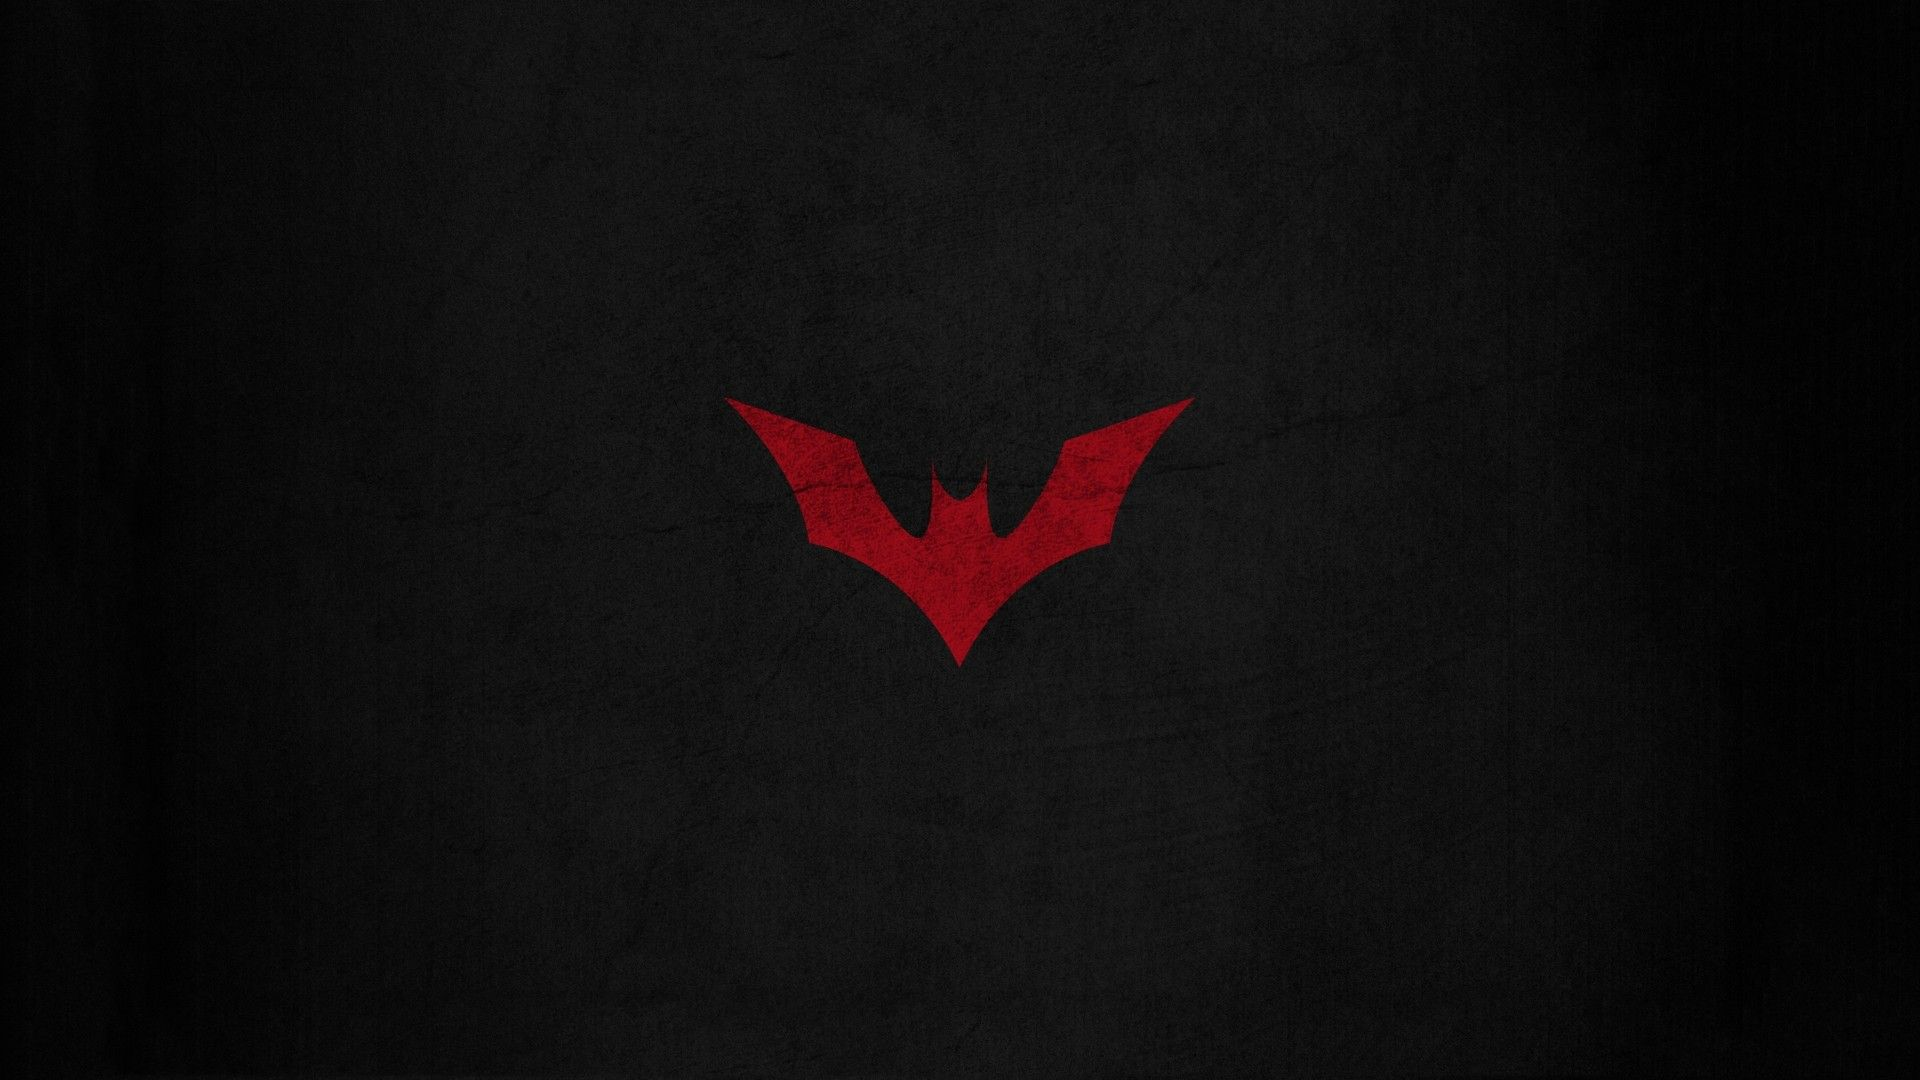 1920x1080 Batman Beyond Computer Wallpaper Batman Hd Logo Wallpaper Batman Wallpaper Batman Wallpapers Hd Batman Wallpaper